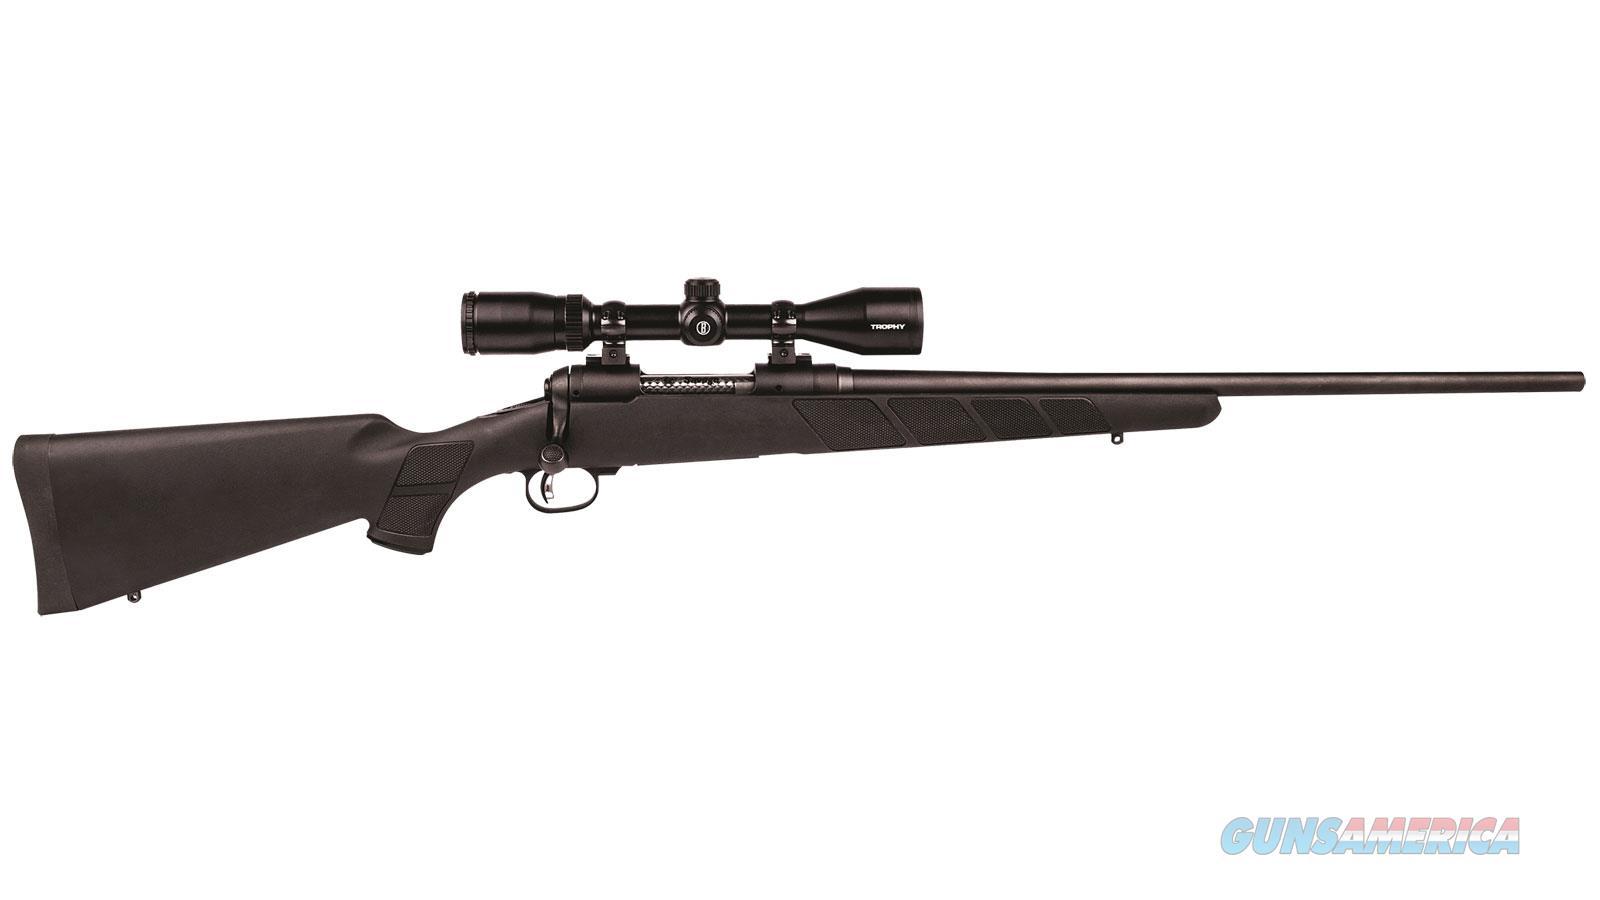 Savage Arms 11 Doa Hunter Xp 6.5Creed 22 22601  Guns > Rifles > S Misc Rifles